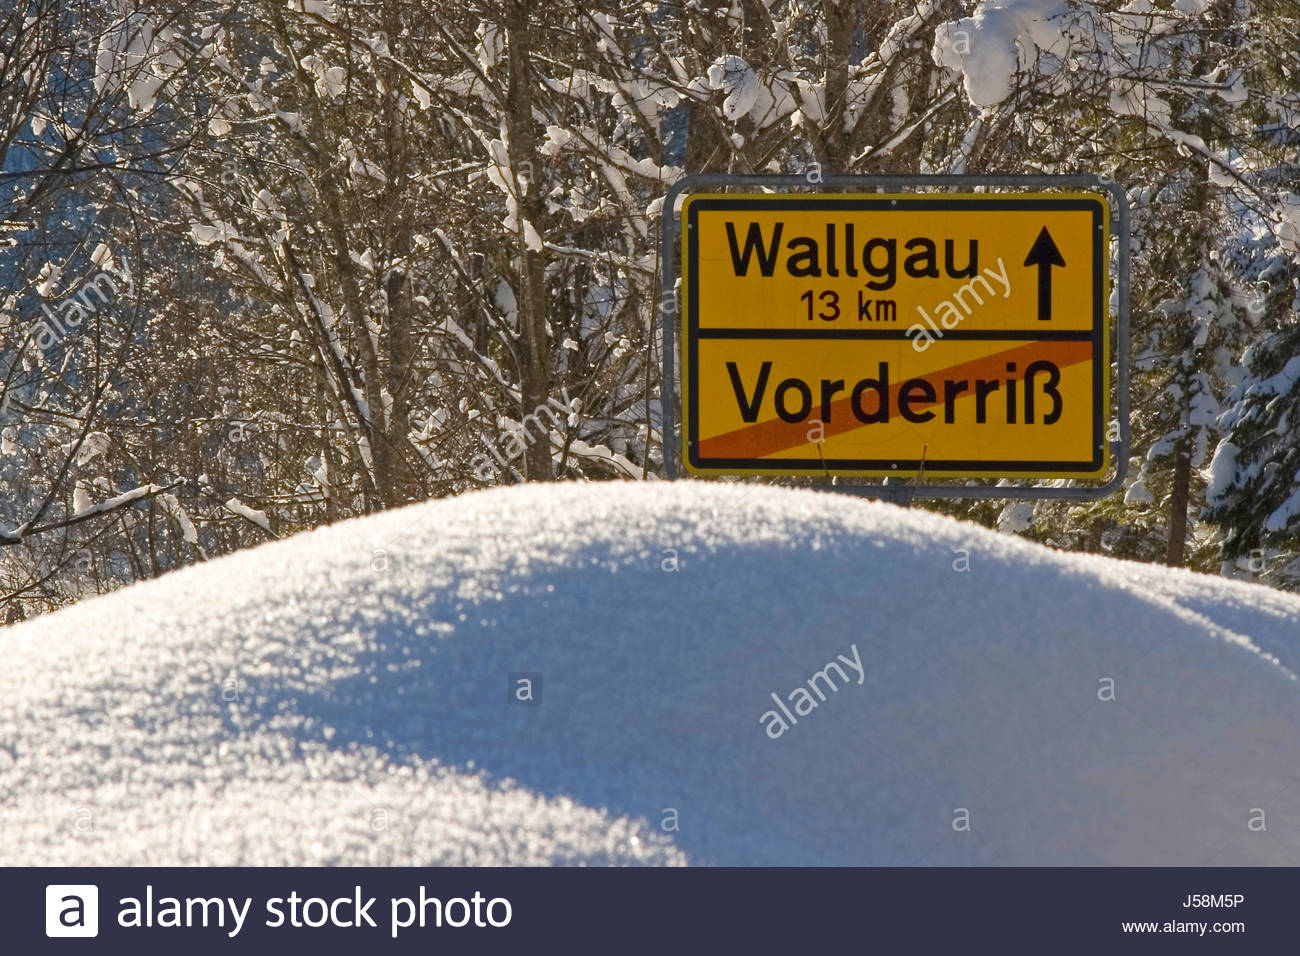 snowed in - Stock Image